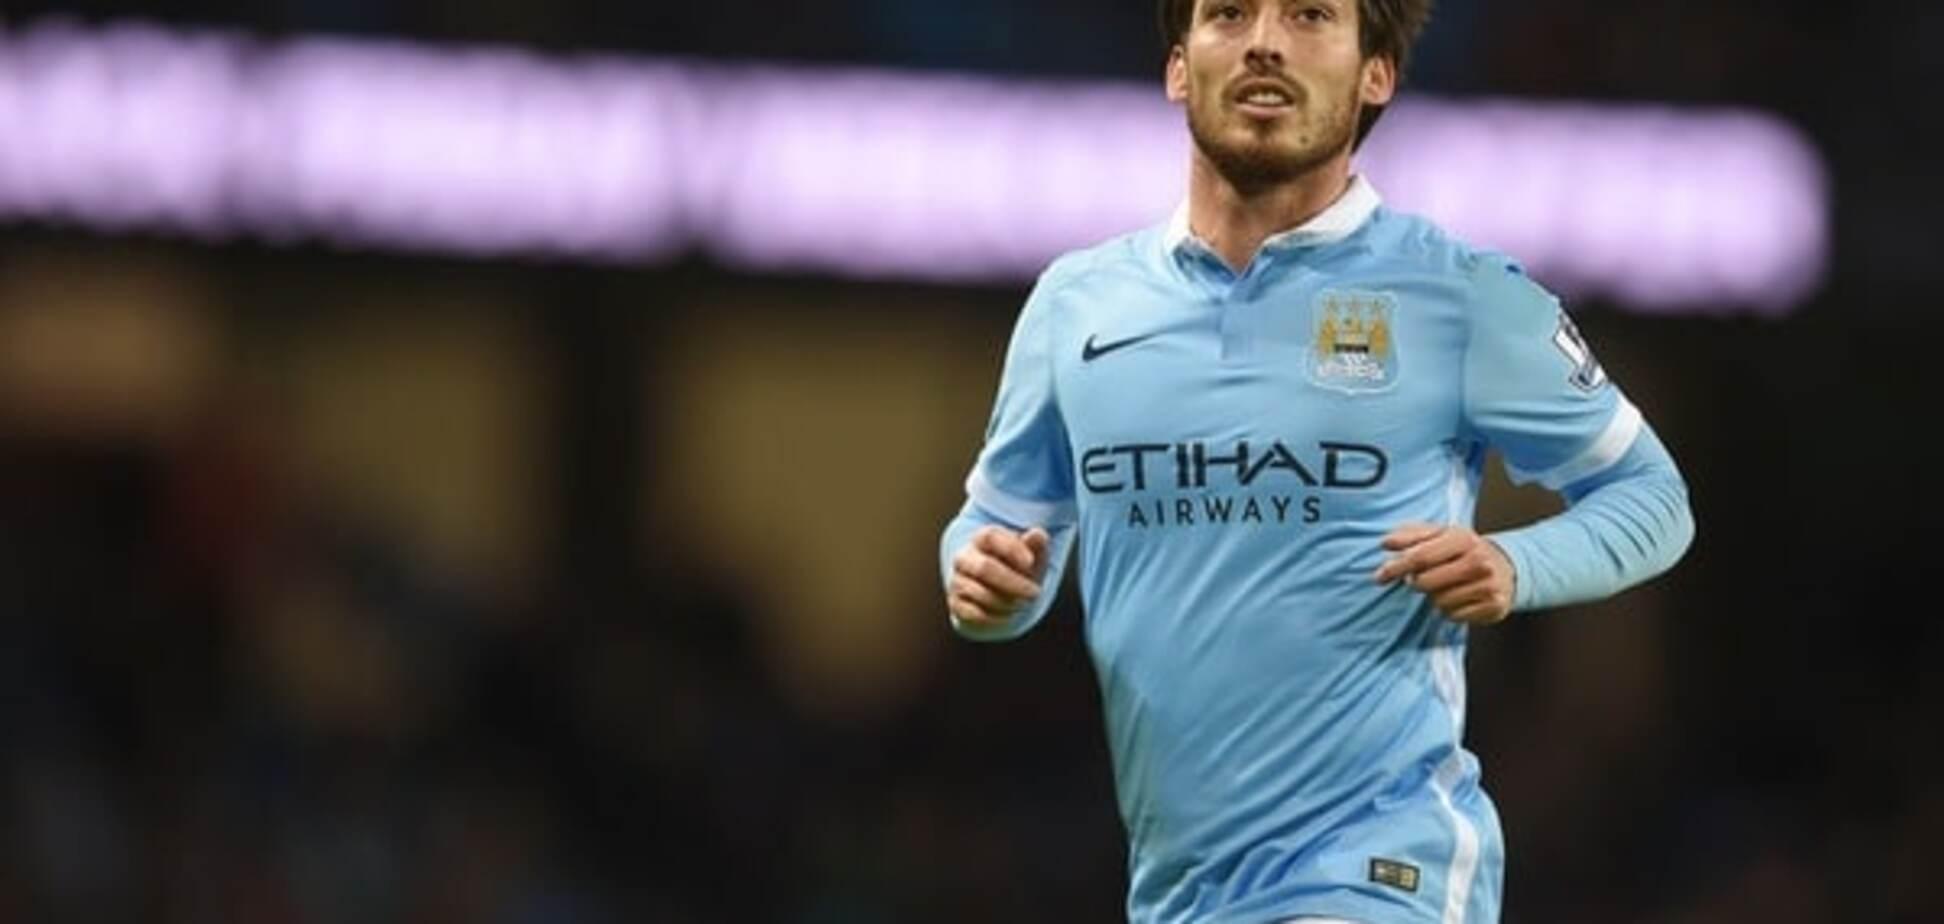 Без звезд: руководство 'Манчестер Сити' приняло неожиданное решение перед матчем с 'Динамо'